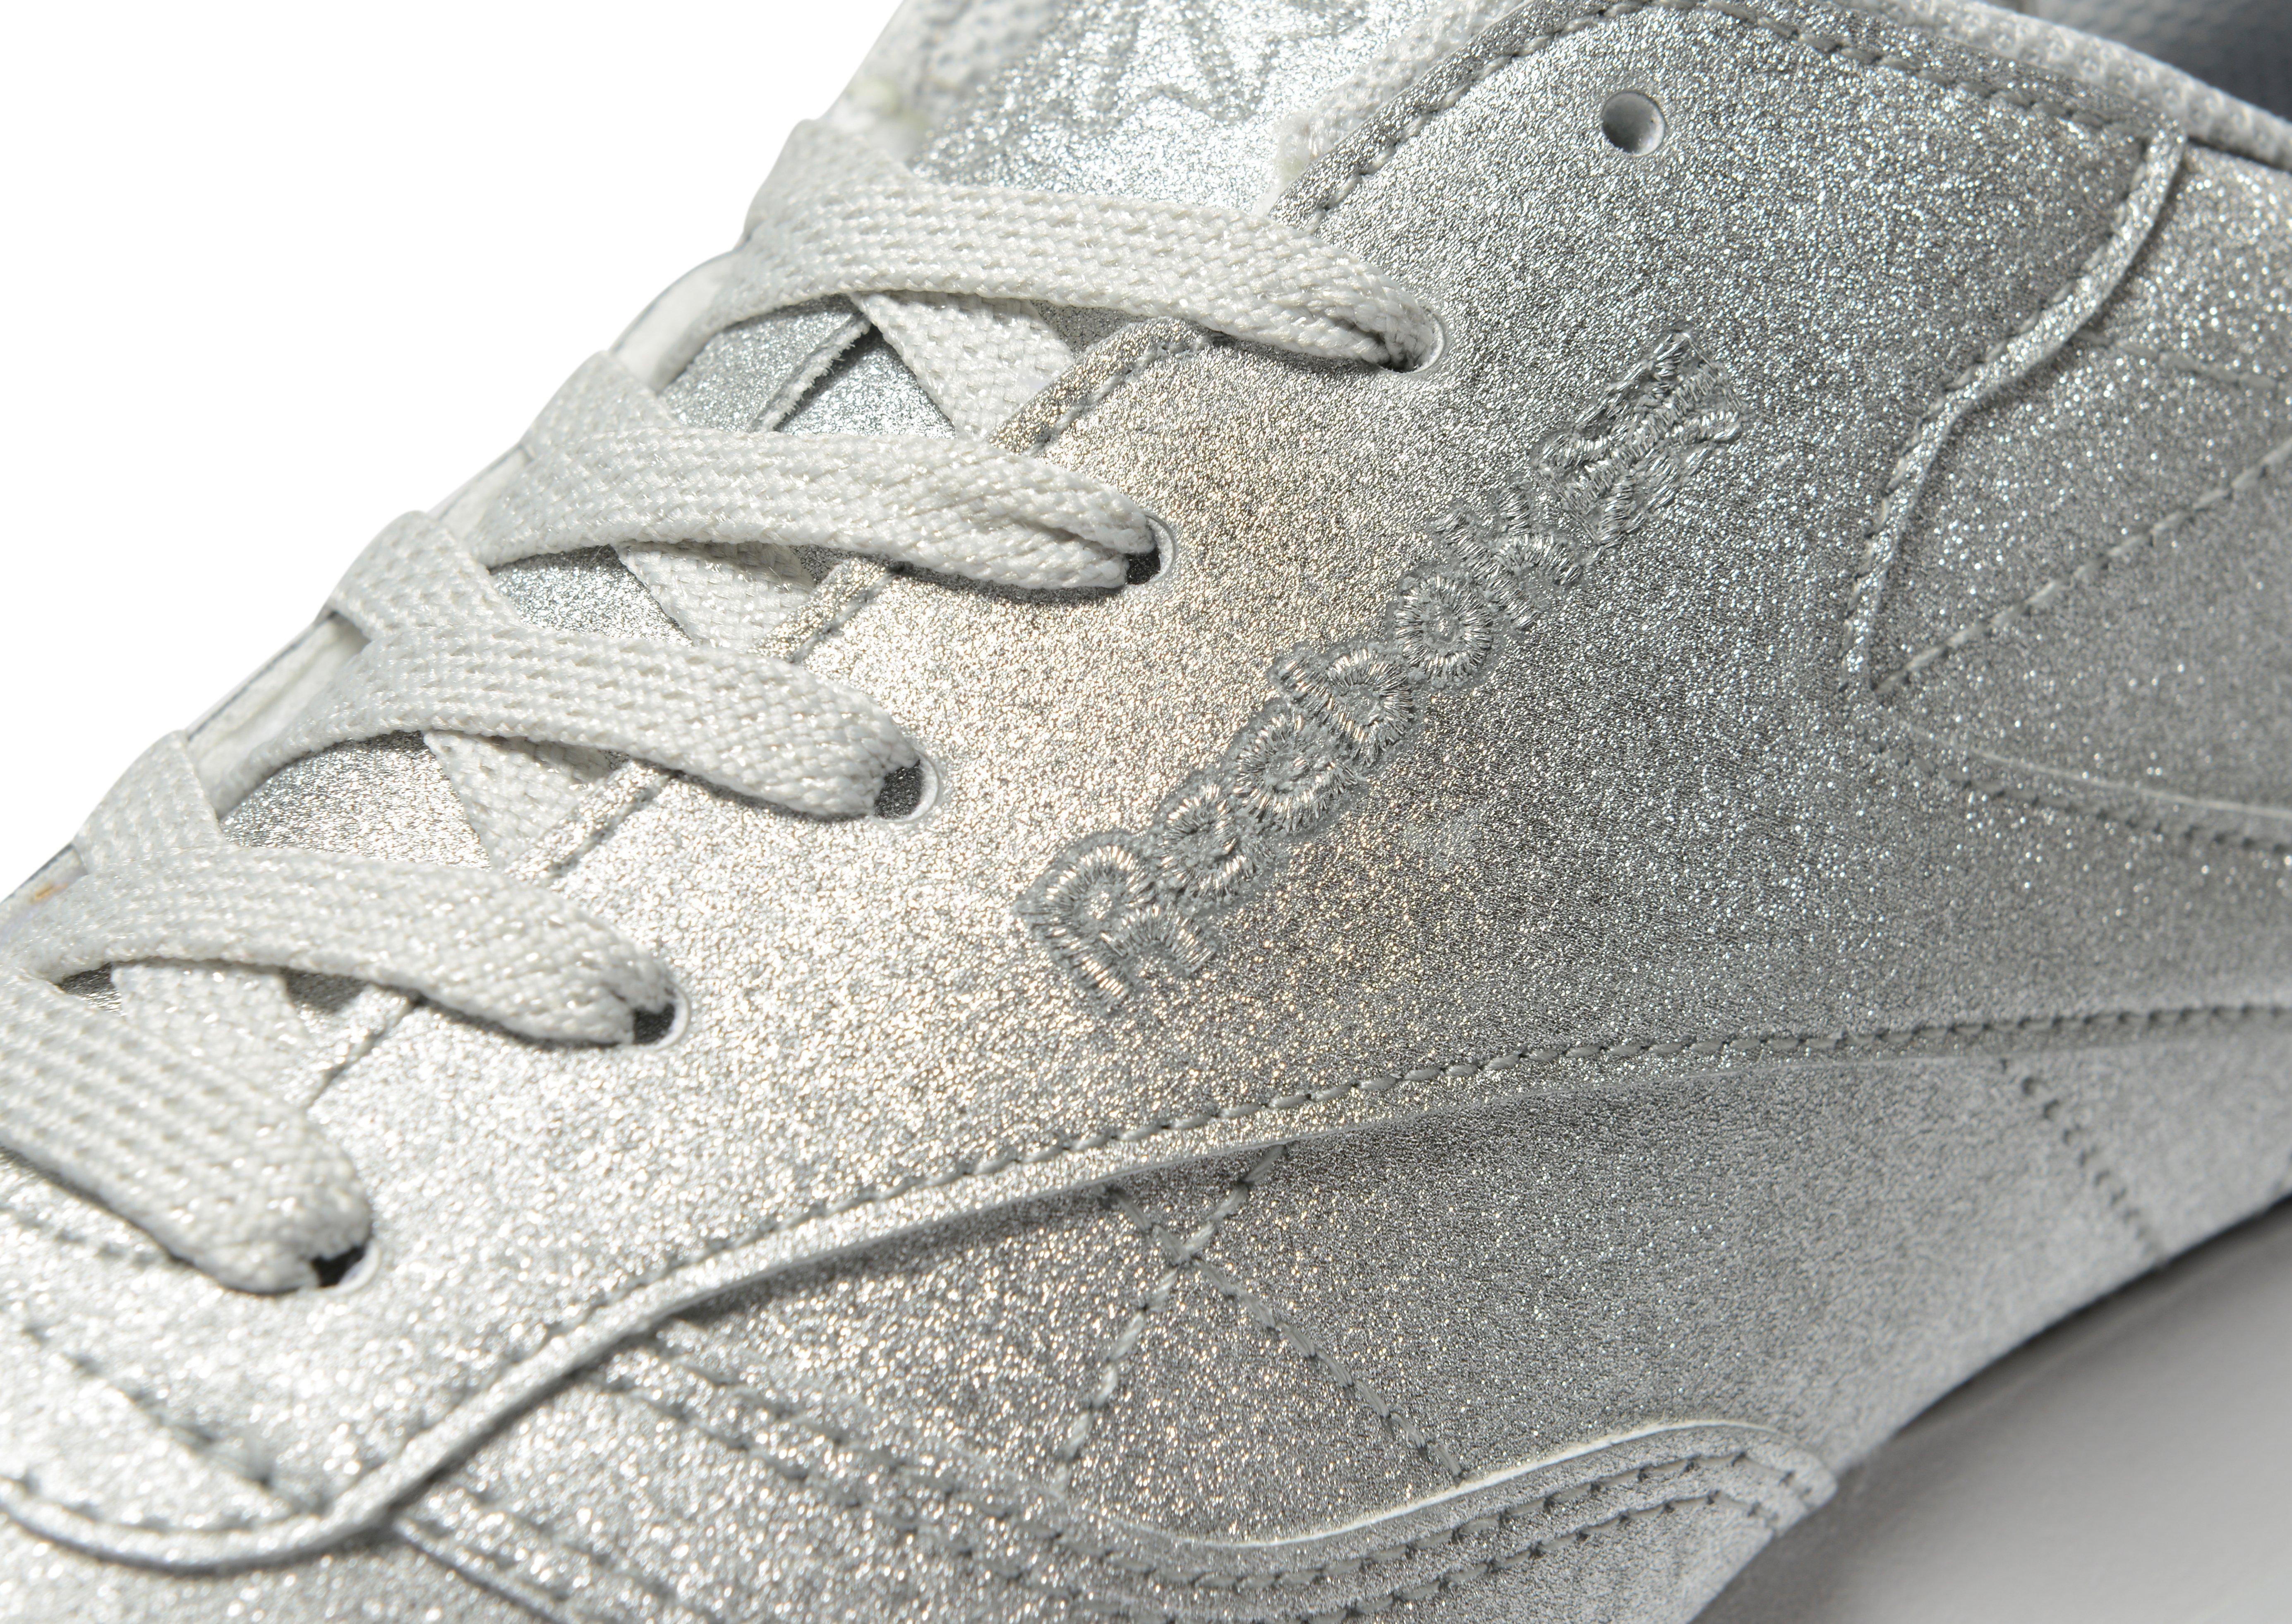 Reebok Classic Leather Glitter in